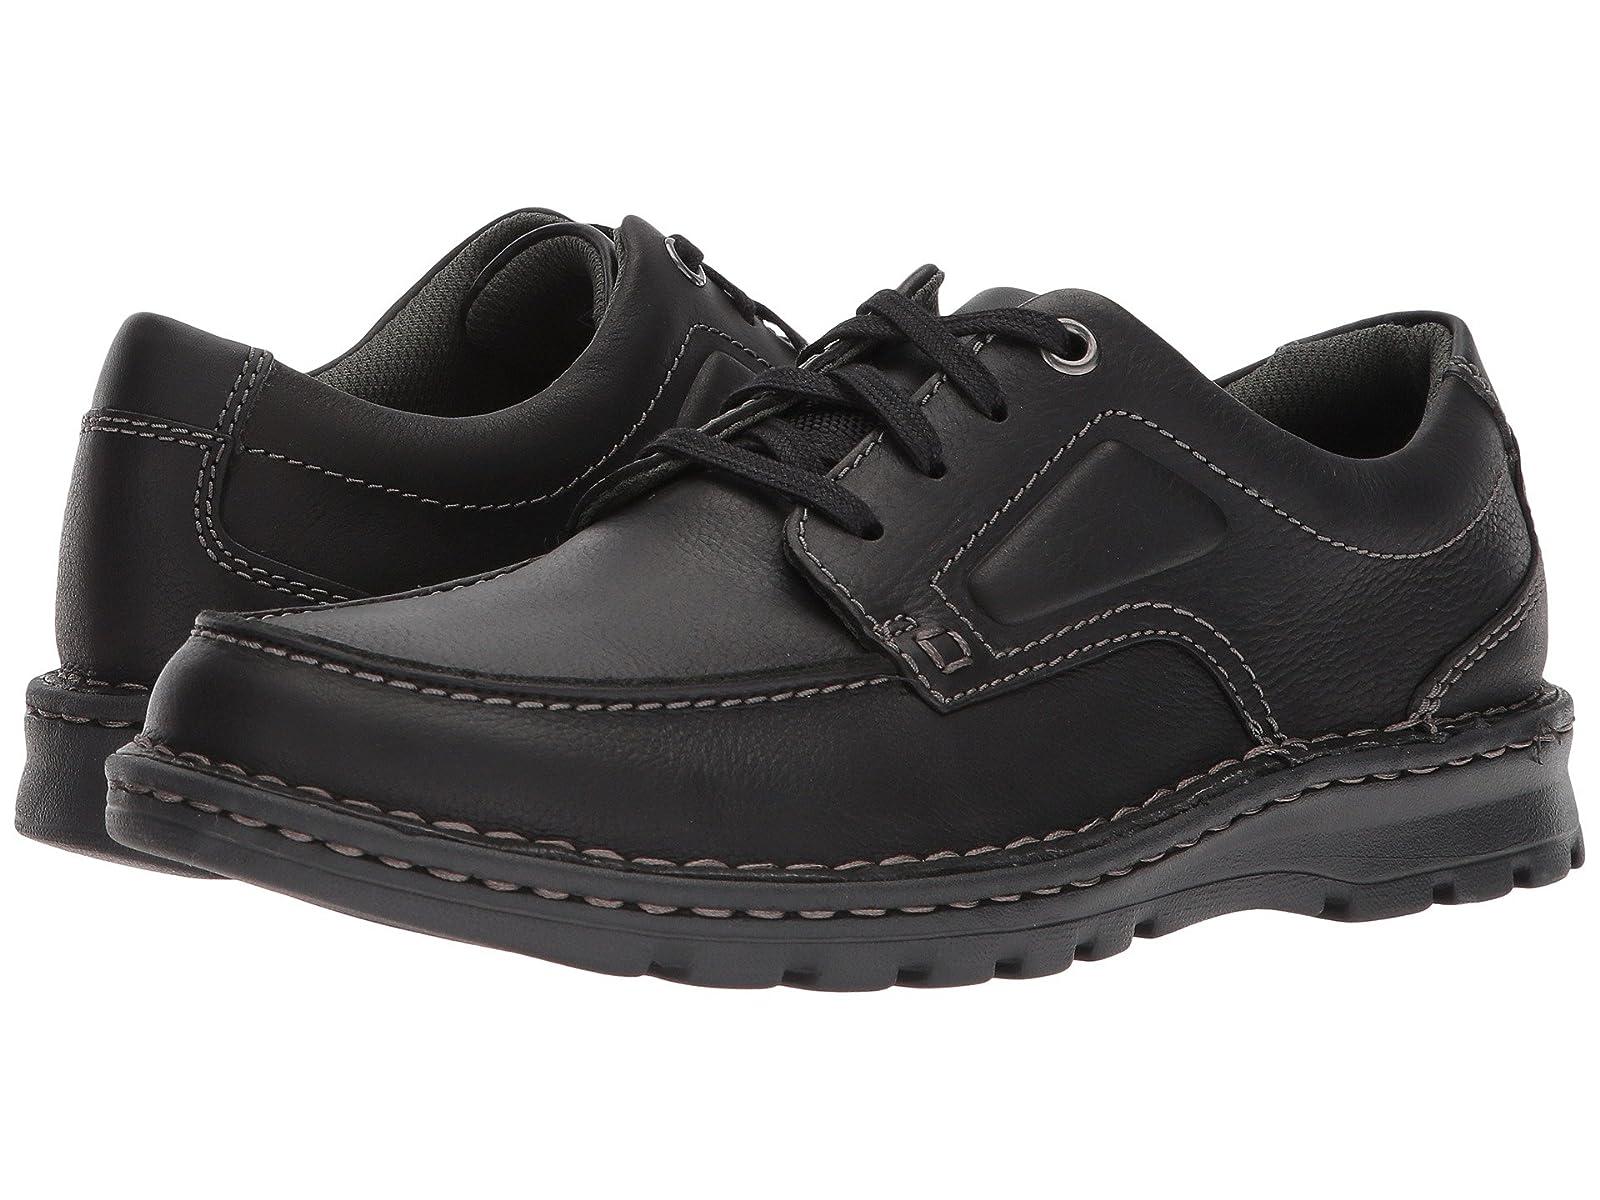 Clarks Vanek ApronCheap and distinctive eye-catching shoes